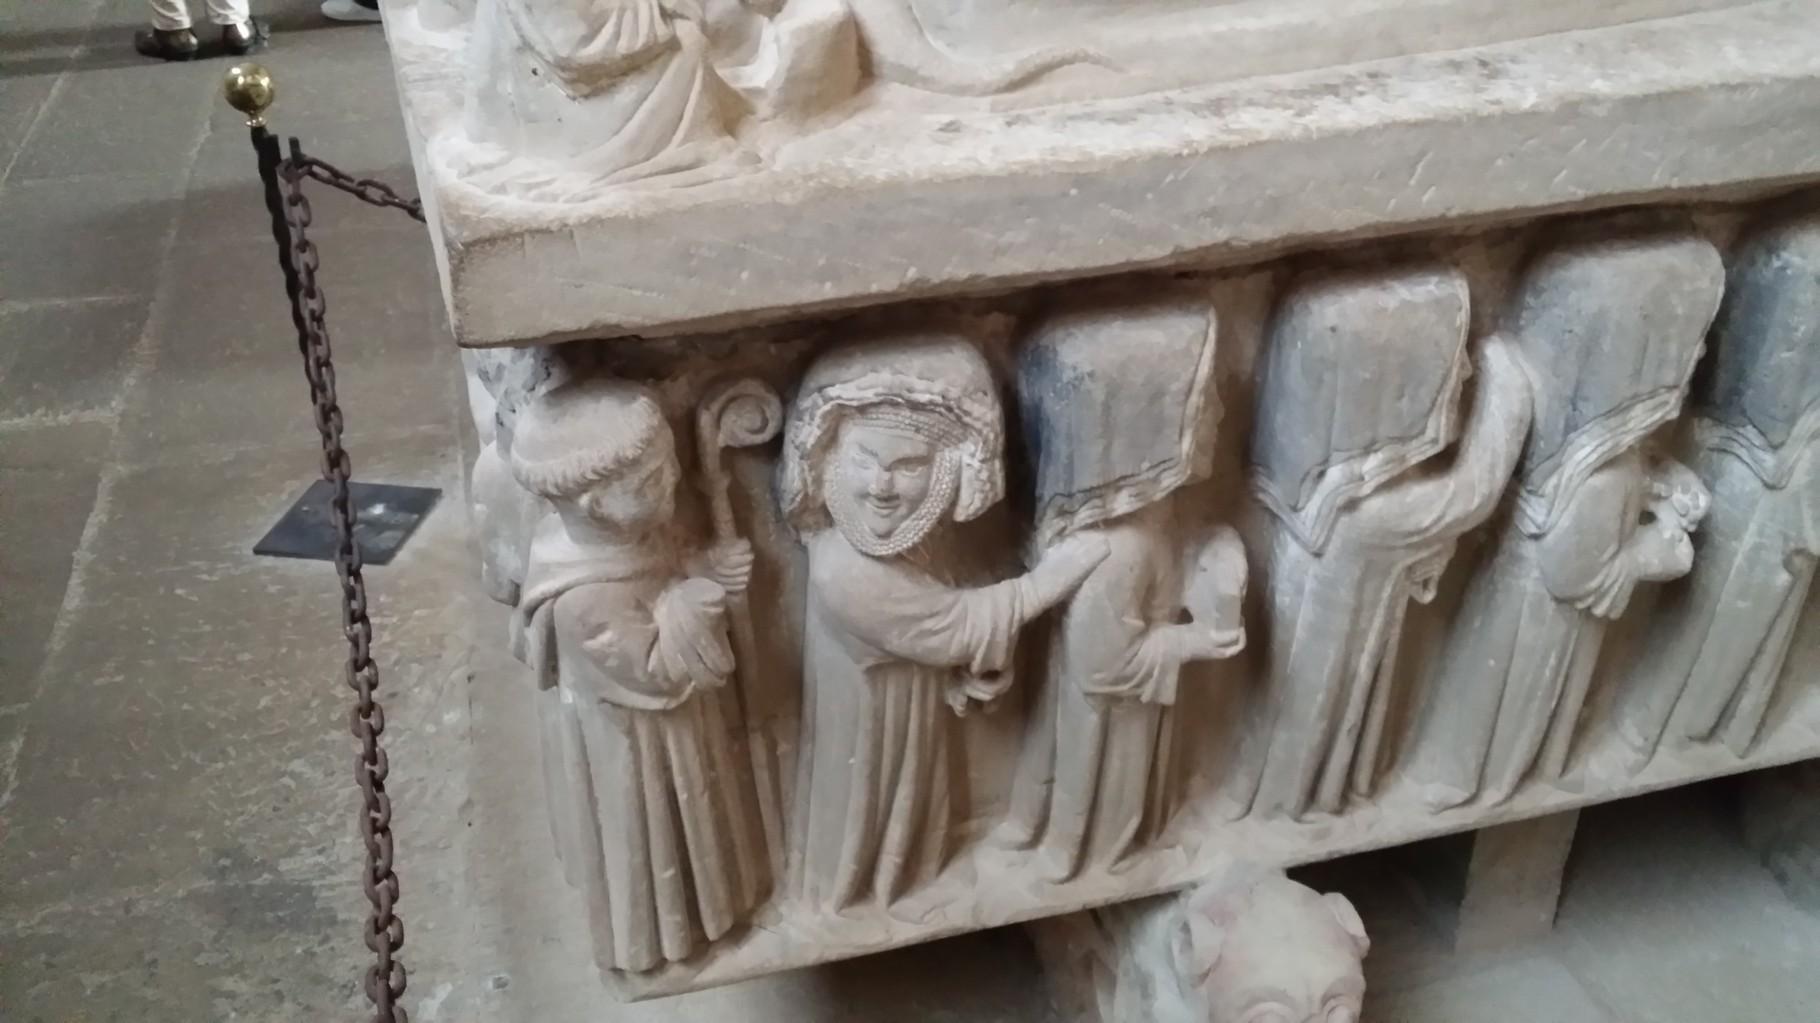 Cañas: au monastère, un sarcophage